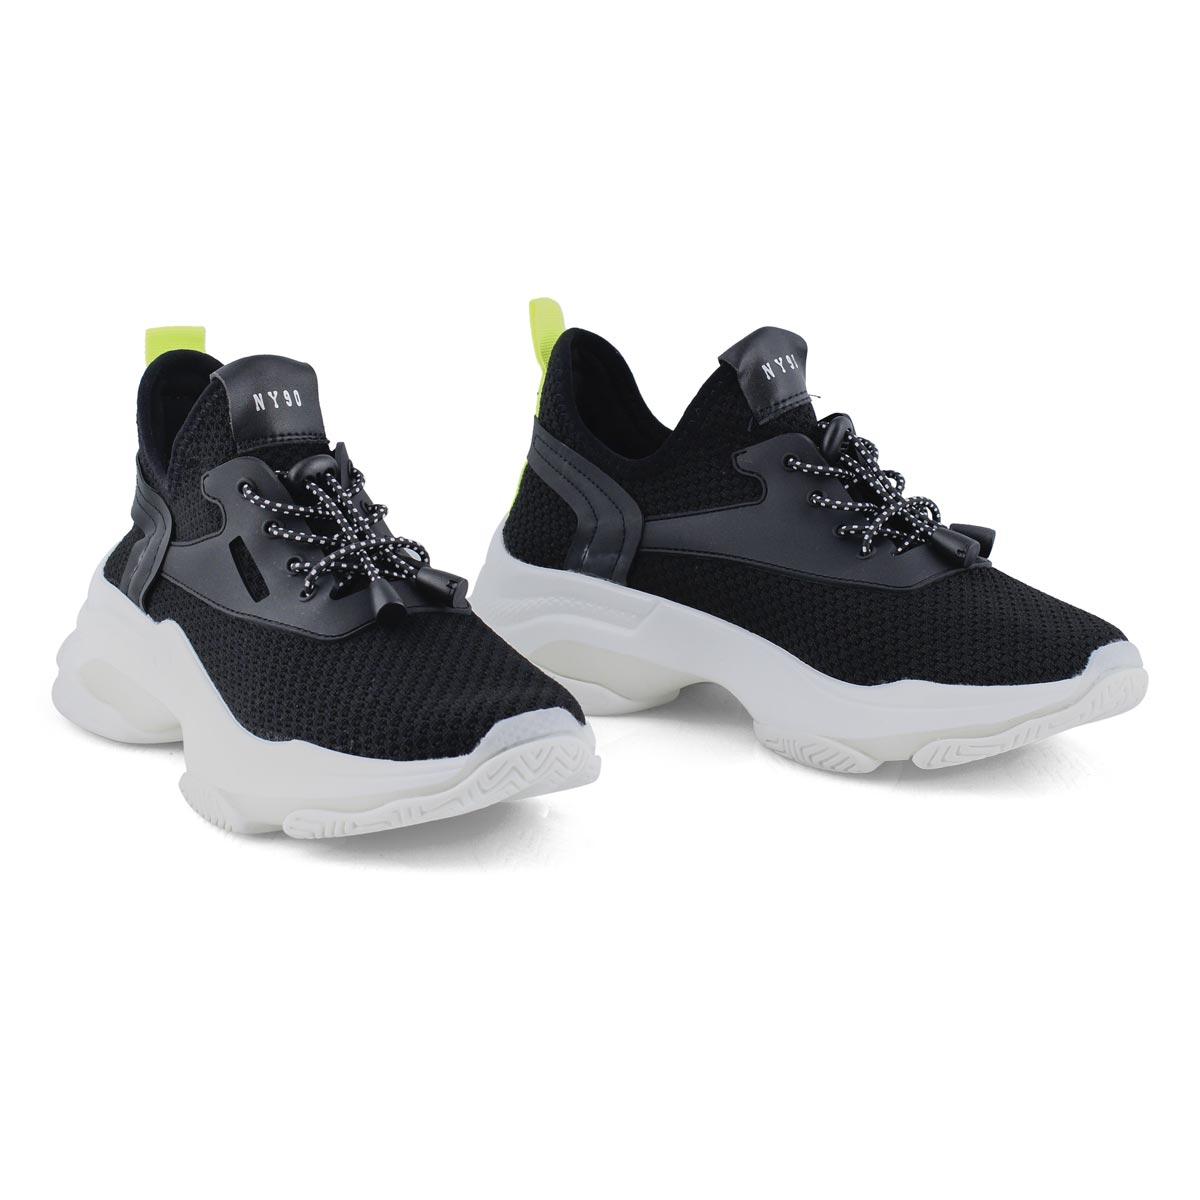 Women's Myles Lace Up Fashion Sneaker - Black